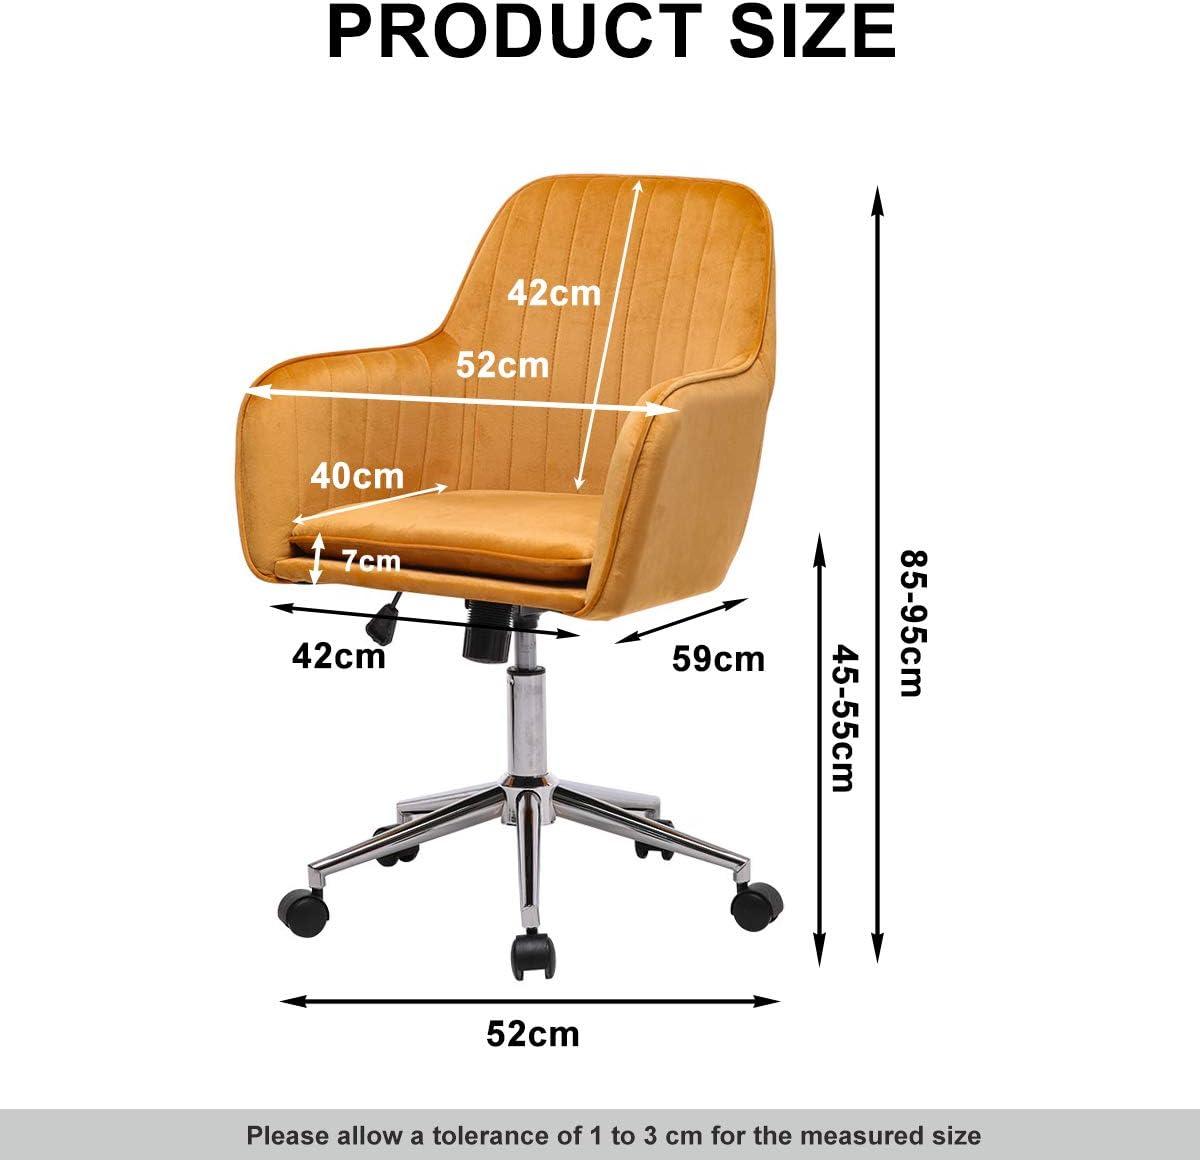 Black Black Velvet Office Chairs Ergonomic Desk Chair with Wheels 360/° Swivel Work Chair Height Adjustable Office Chair with Arms Computer Chair for Home Office